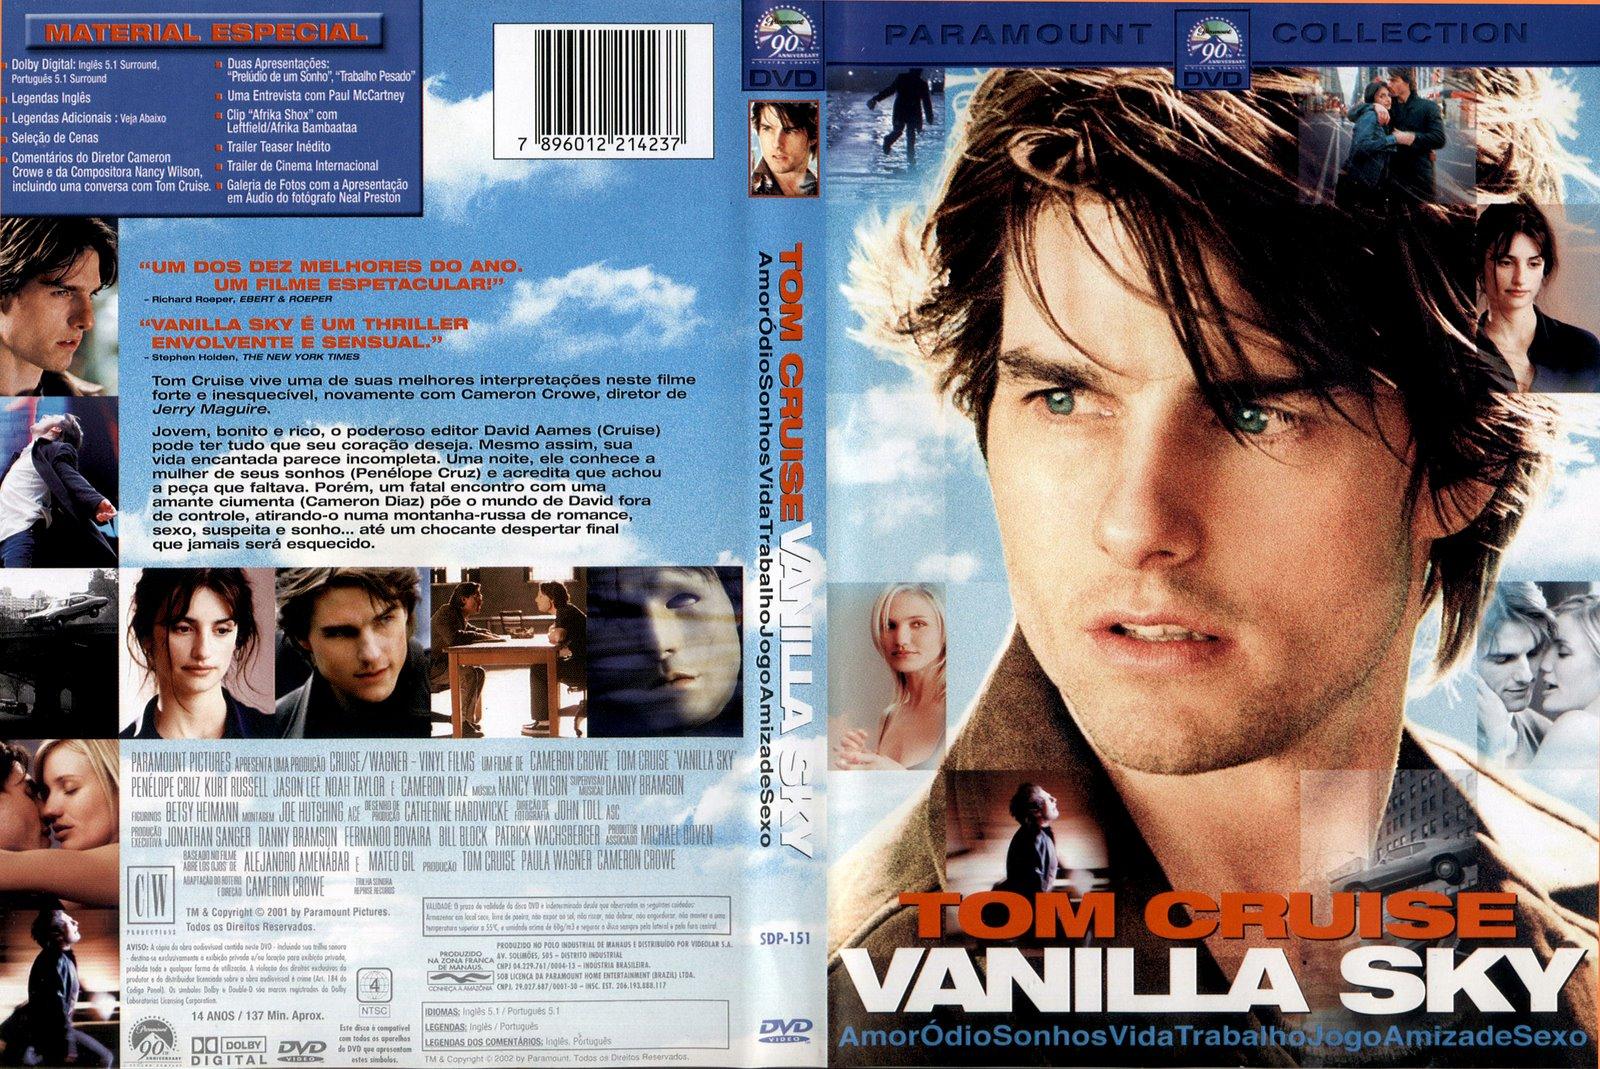 http://3.bp.blogspot.com/_56N_enXK-4o/TE2CWSMGzuI/AAAAAAAAAVQ/JFcAD0Kt2ck/s1600/Vanilla+Sky.jpg